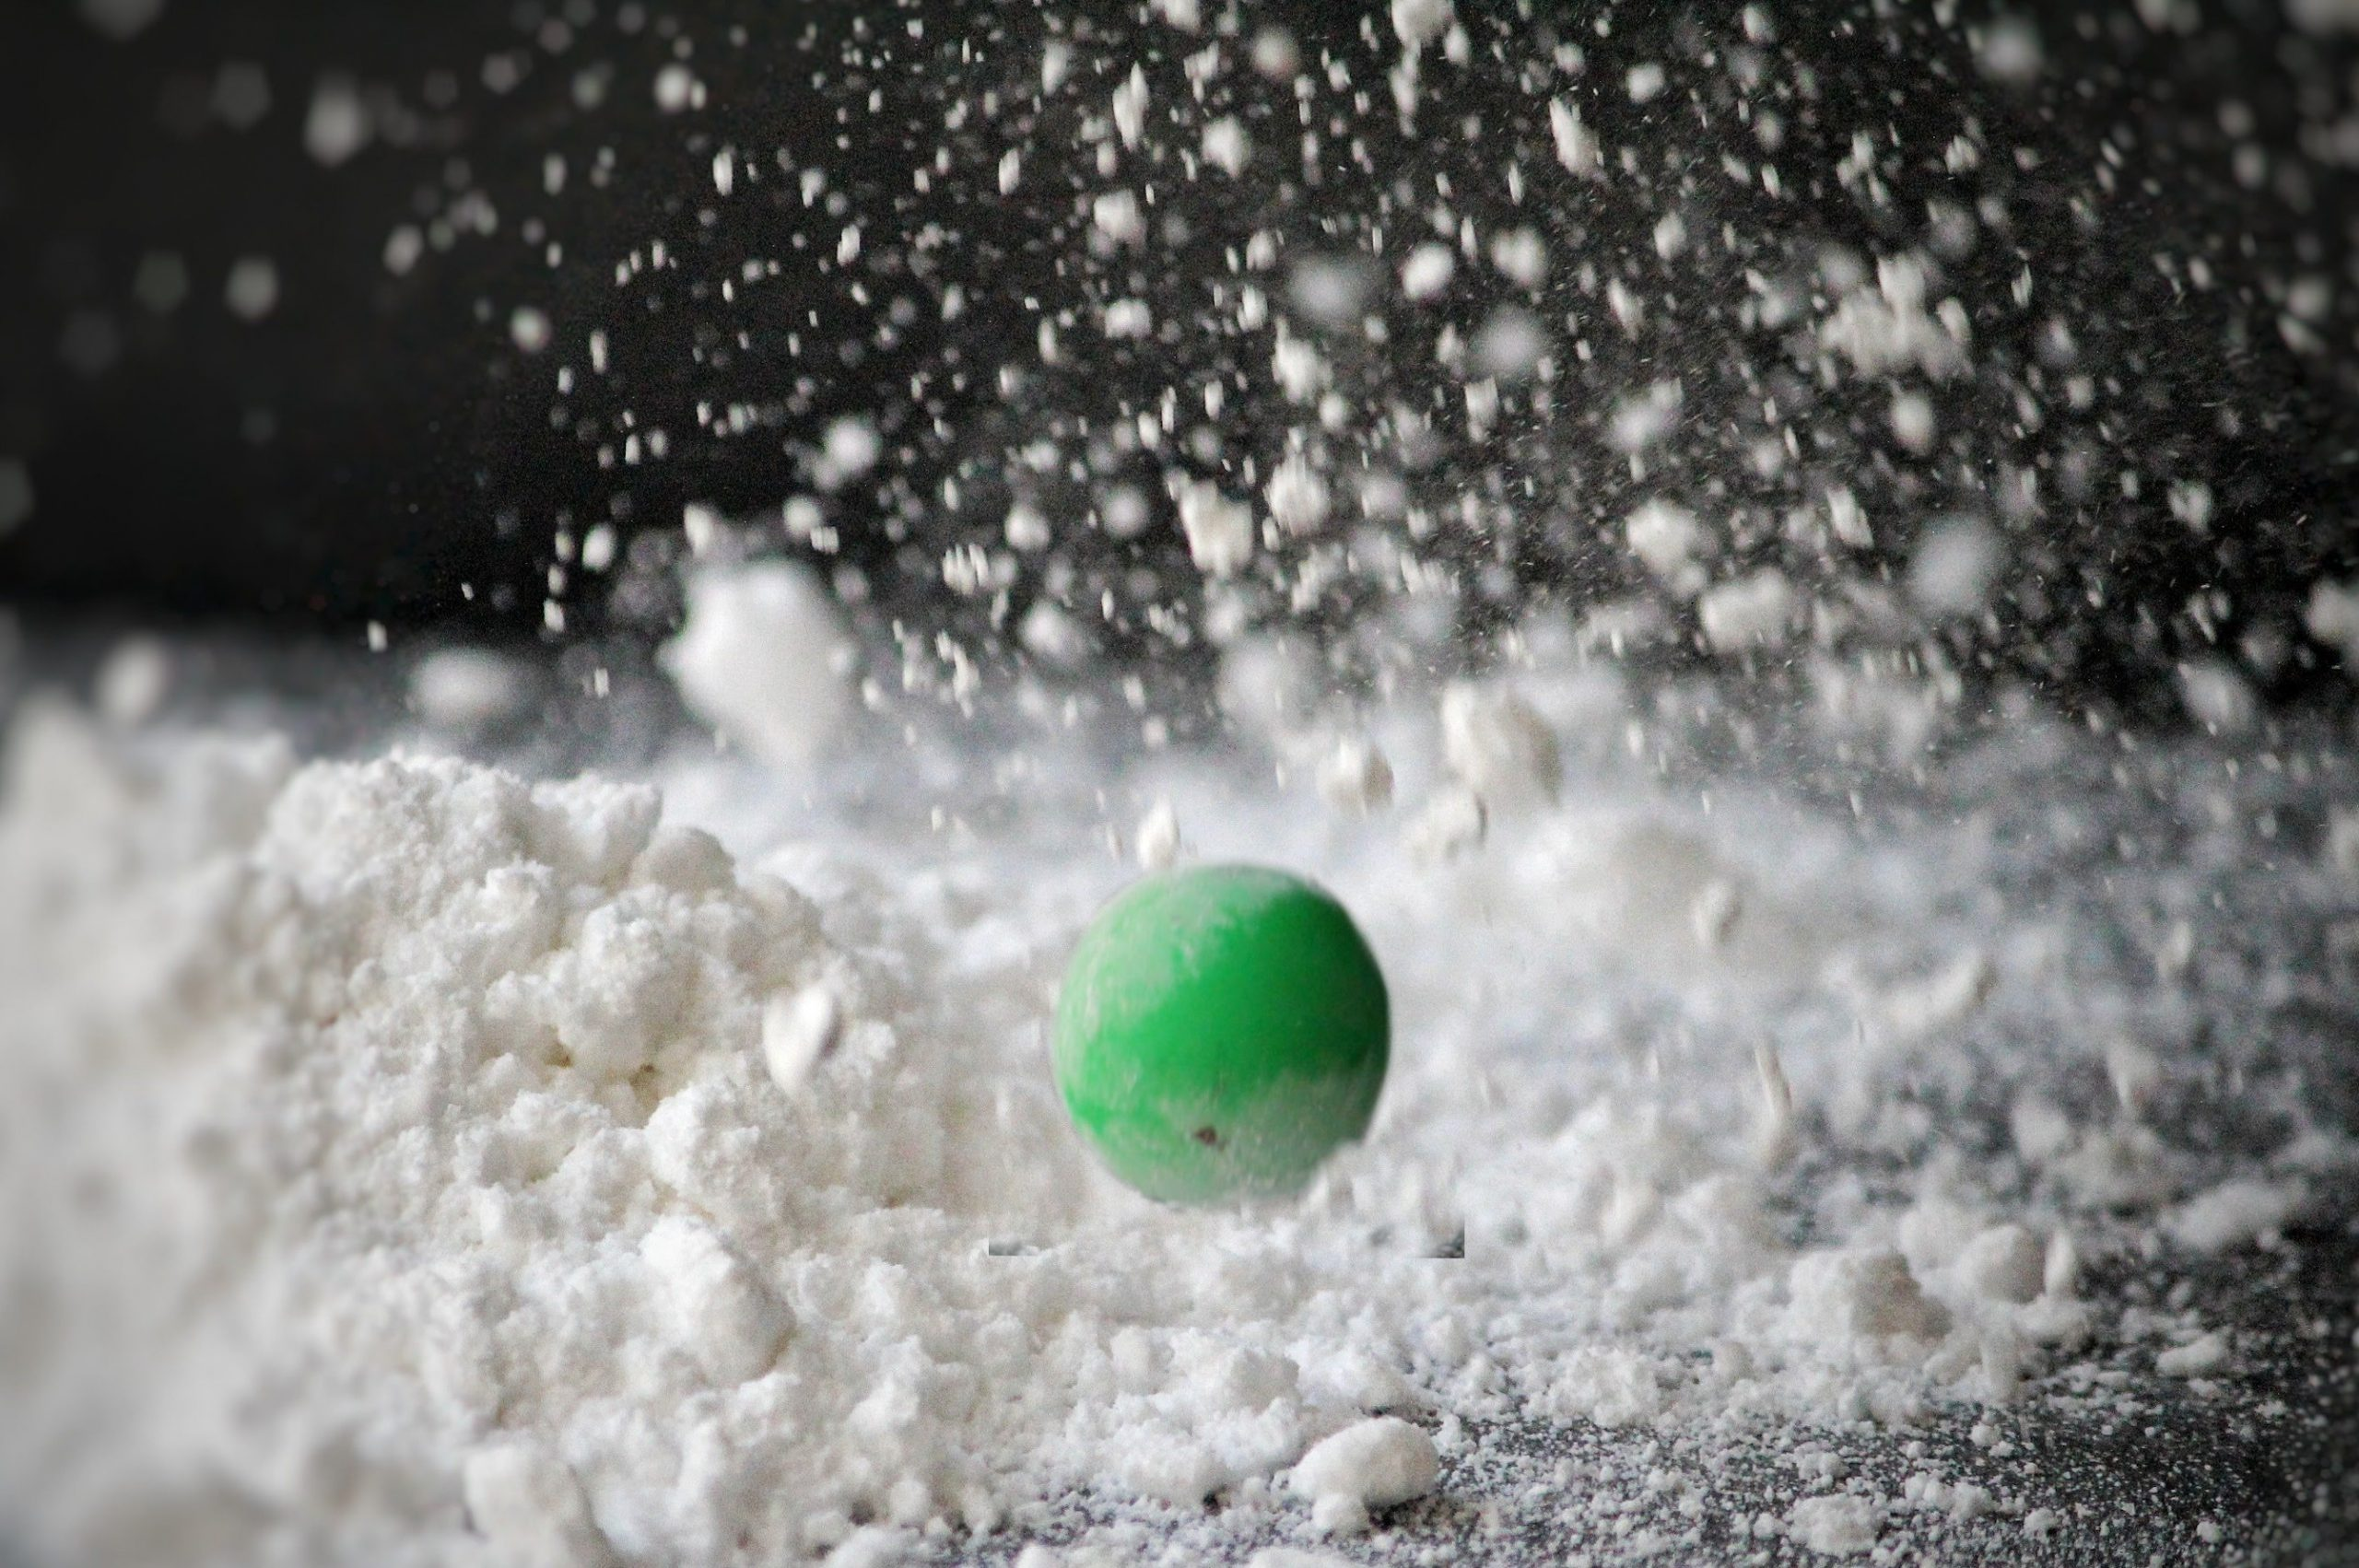 Ball bounding on powder